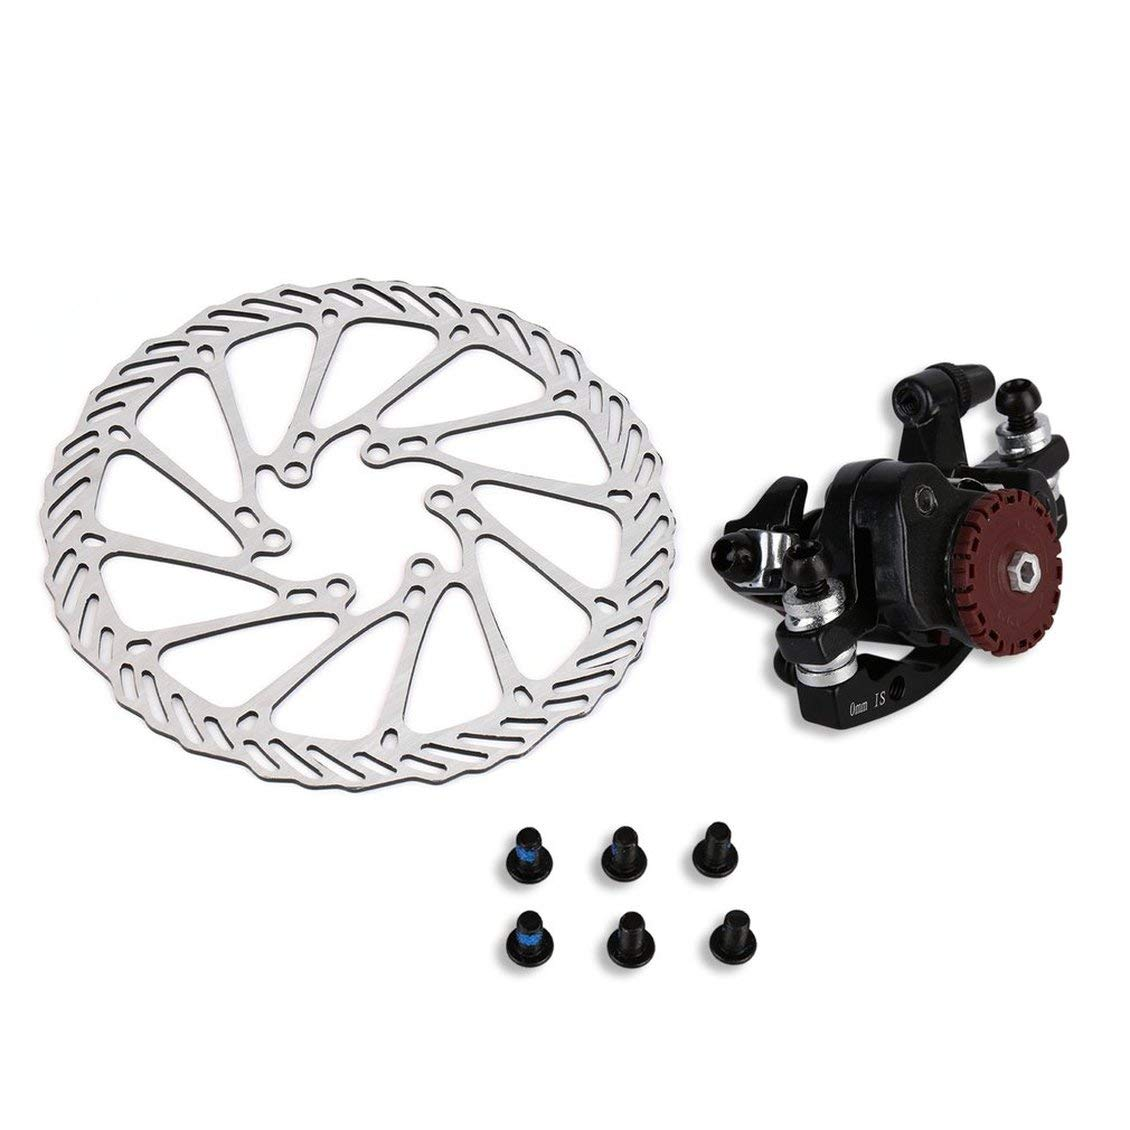 Hgih Quality BB7 MTB Bike Brakes Disc Caliper Mechanical Front Wheel 160mm Rotor Brand PGIGE